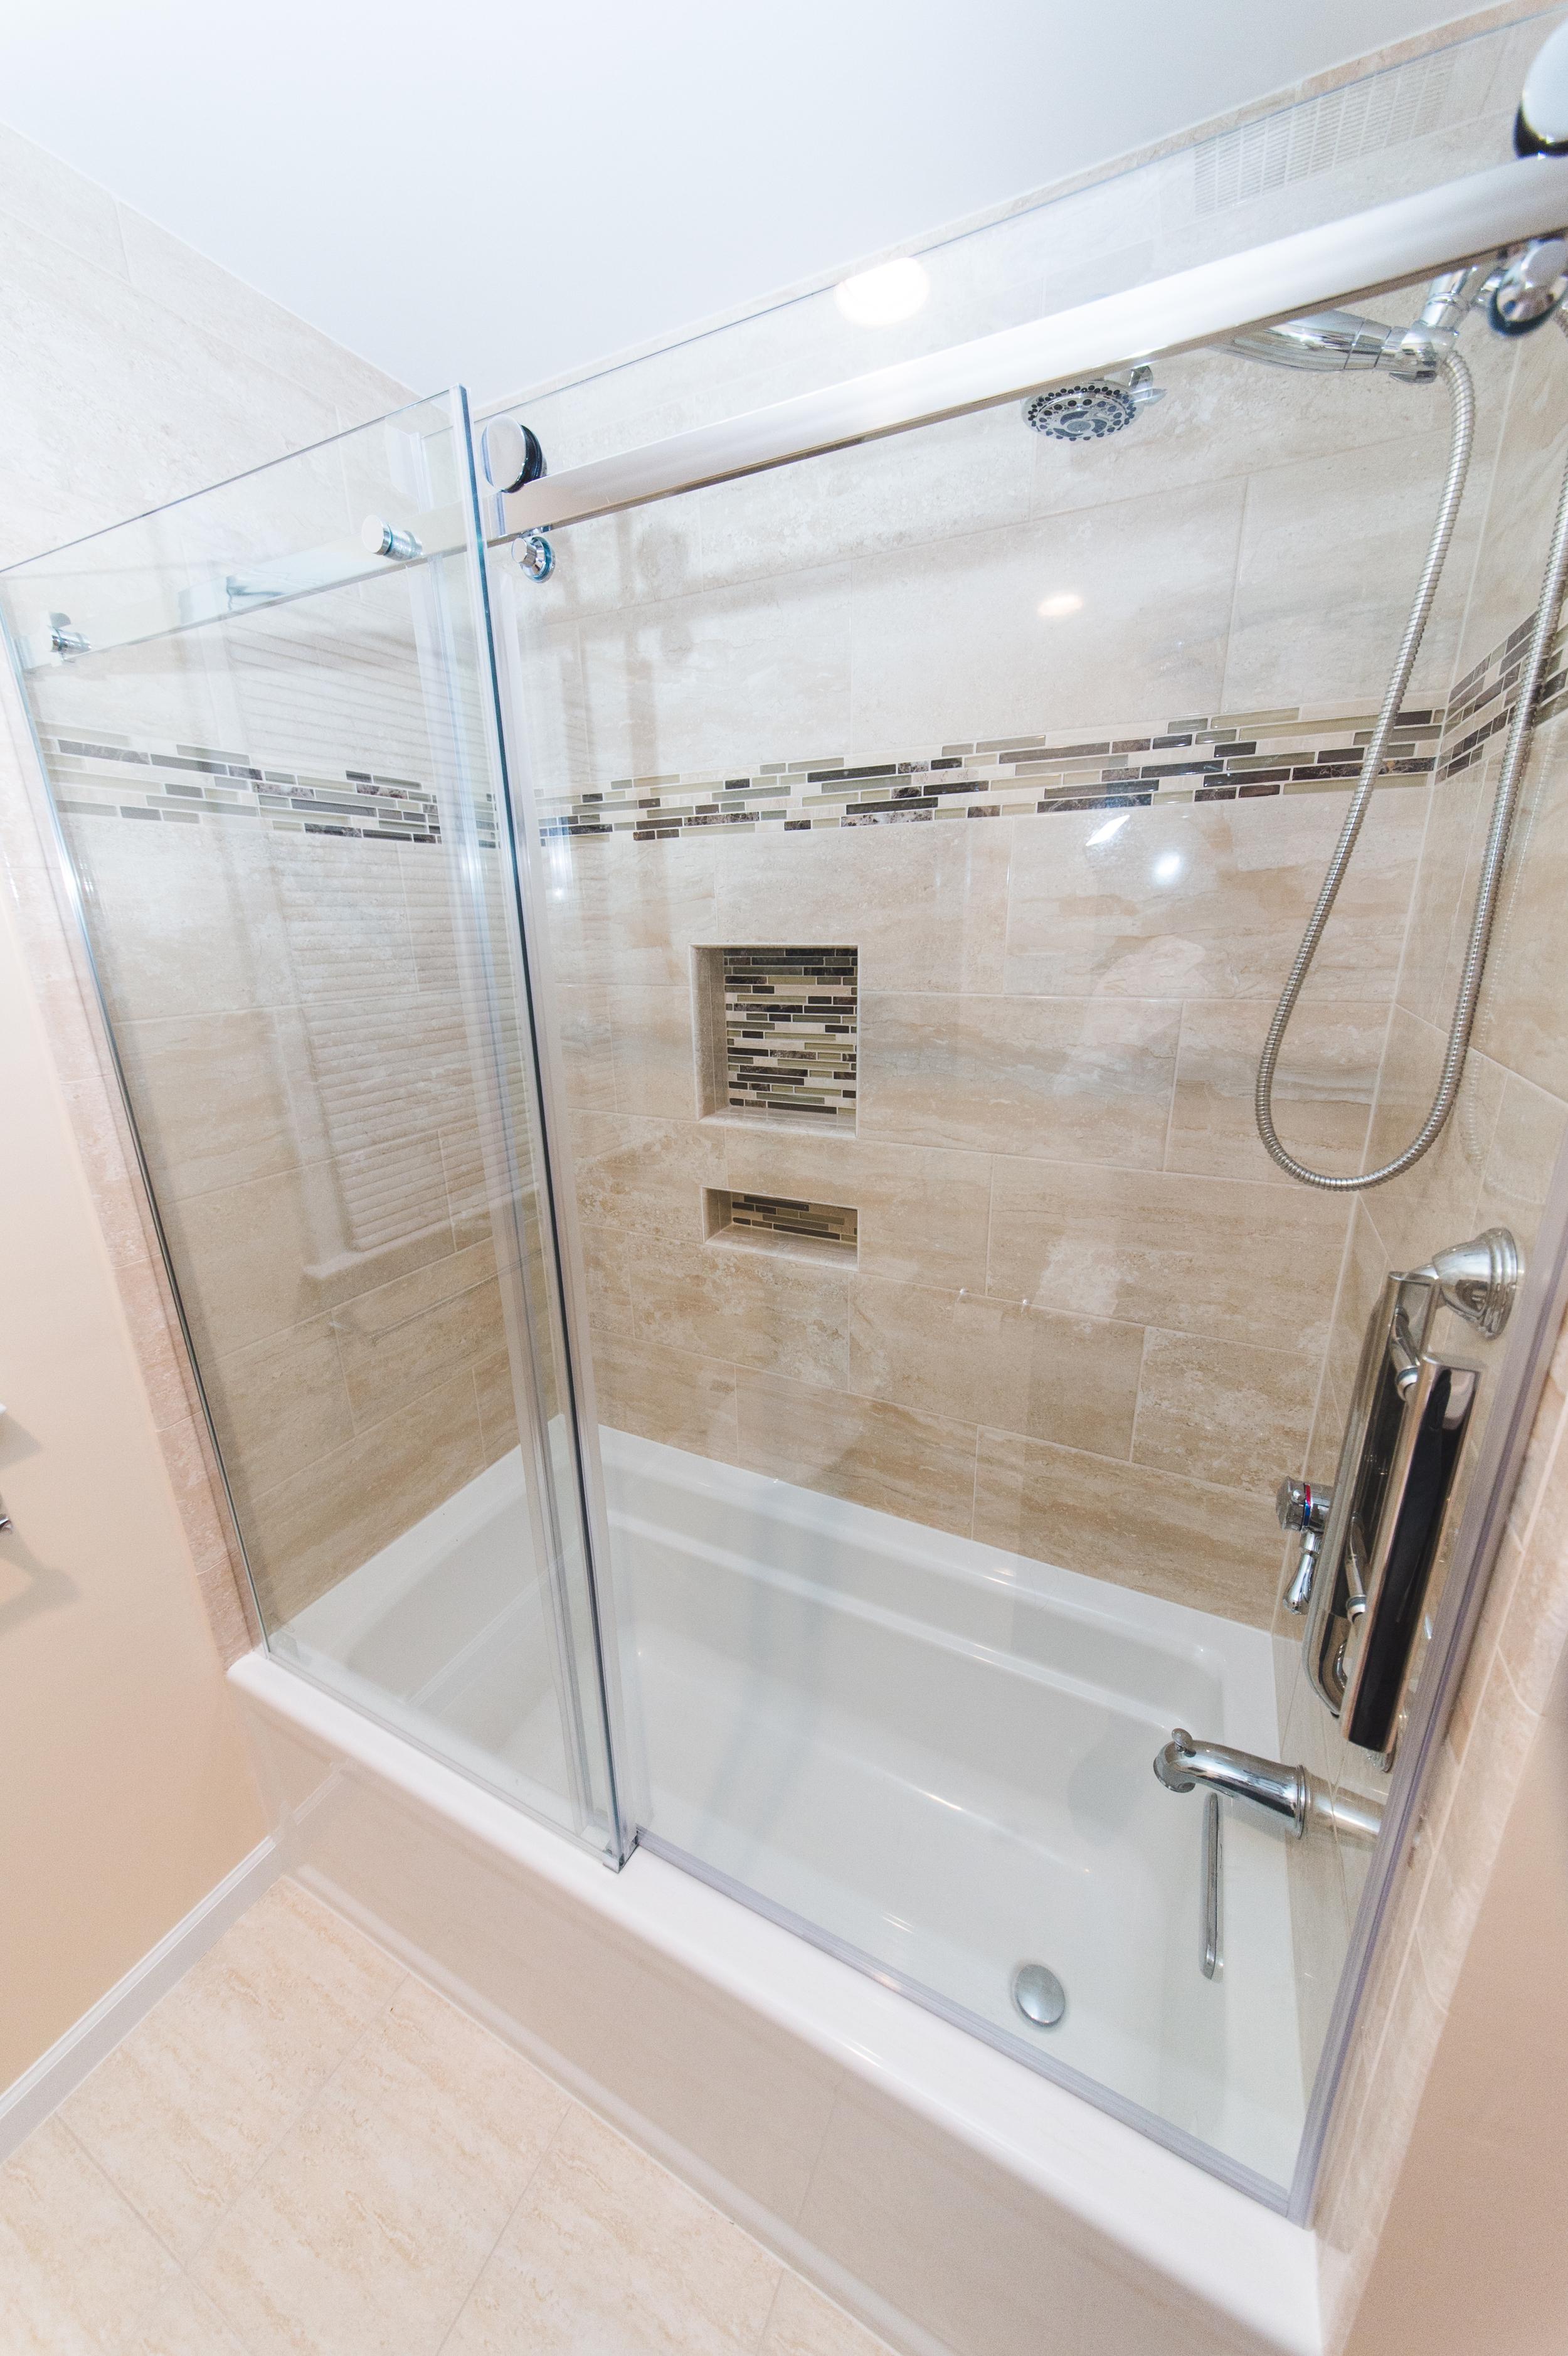 Zhiru Bathroom Remodeling Ellicott City MD-9.jpg